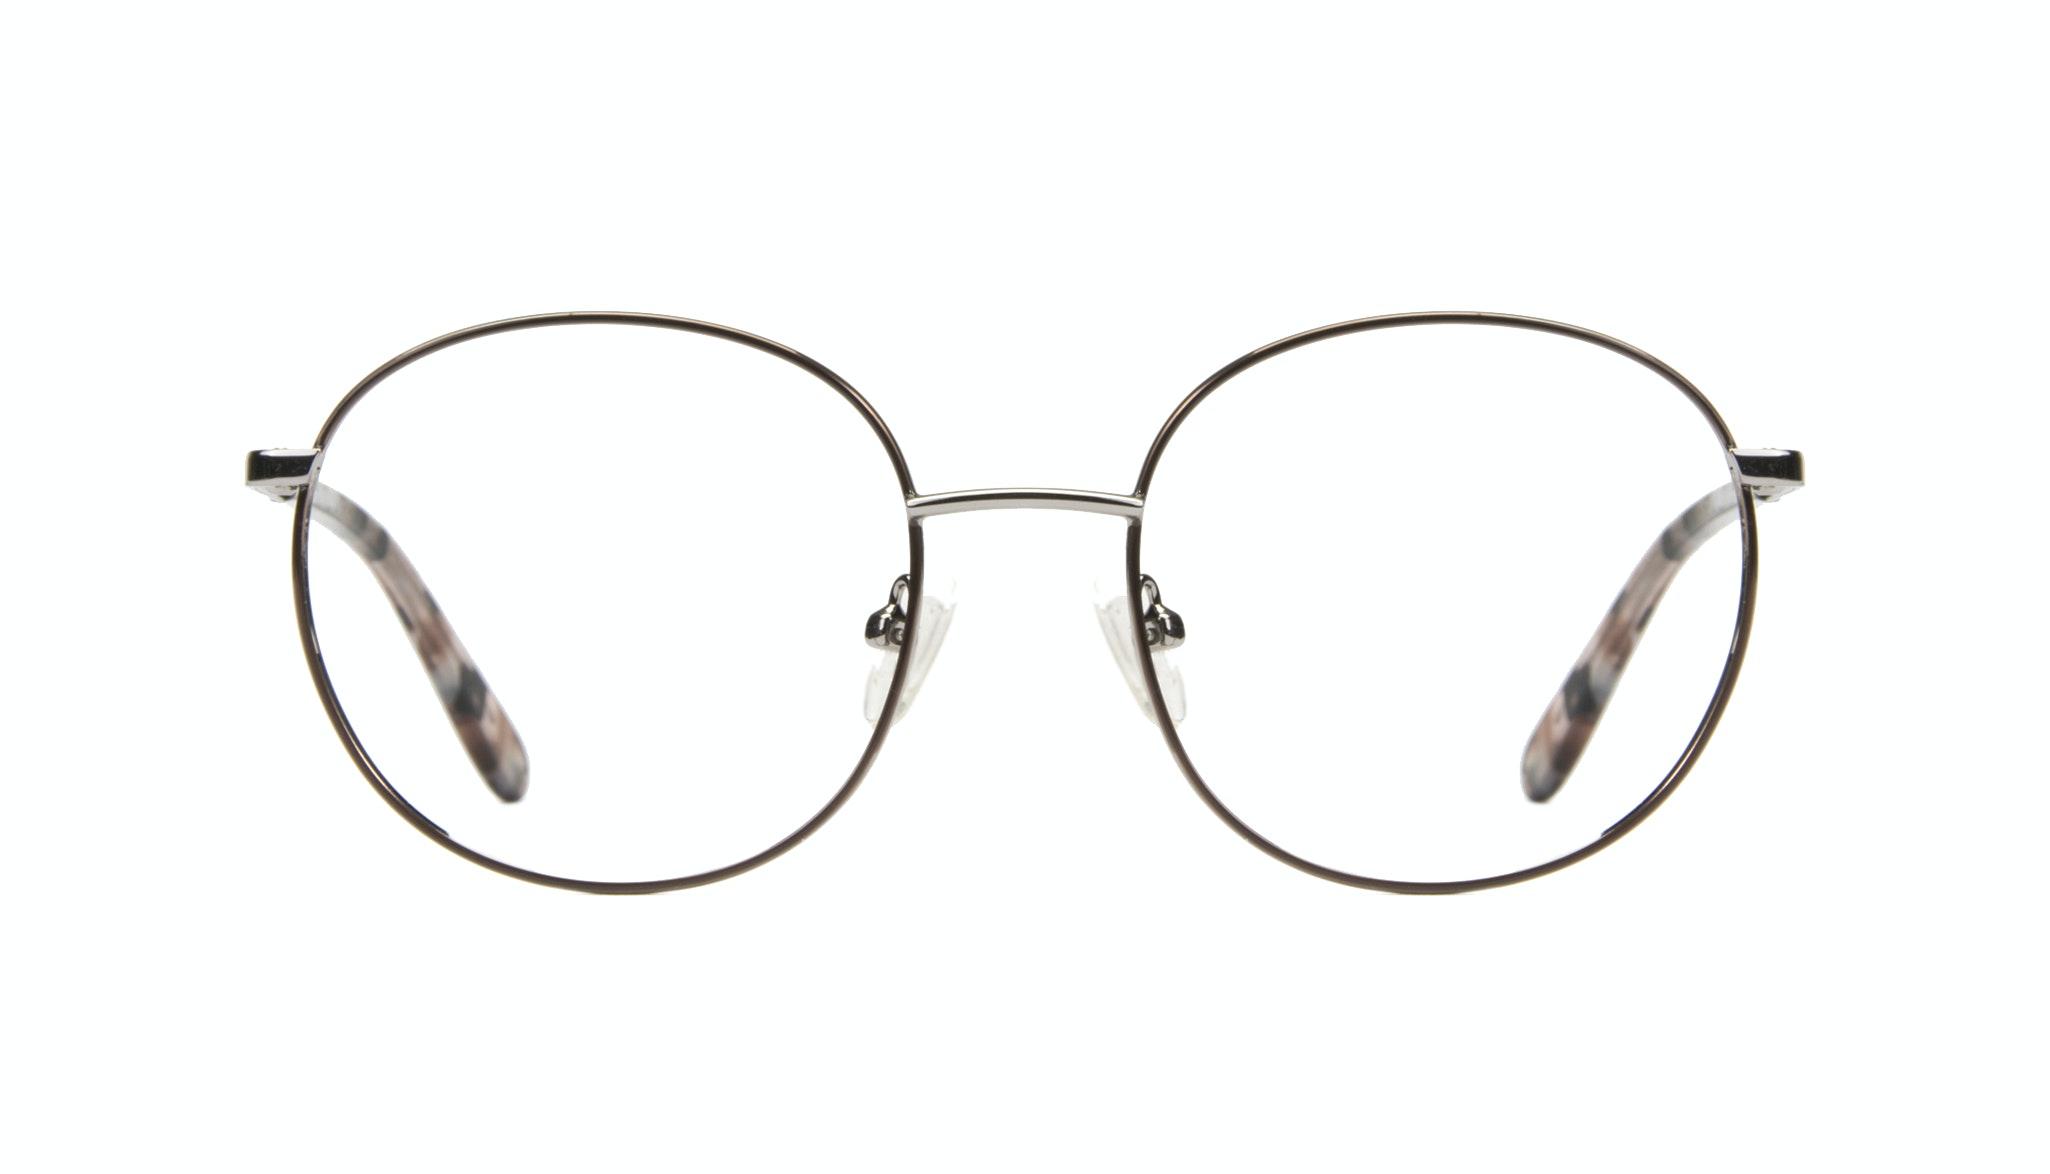 Affordable Fashion Glasses Round Eyeglasses Women Joy Rose Metal Front